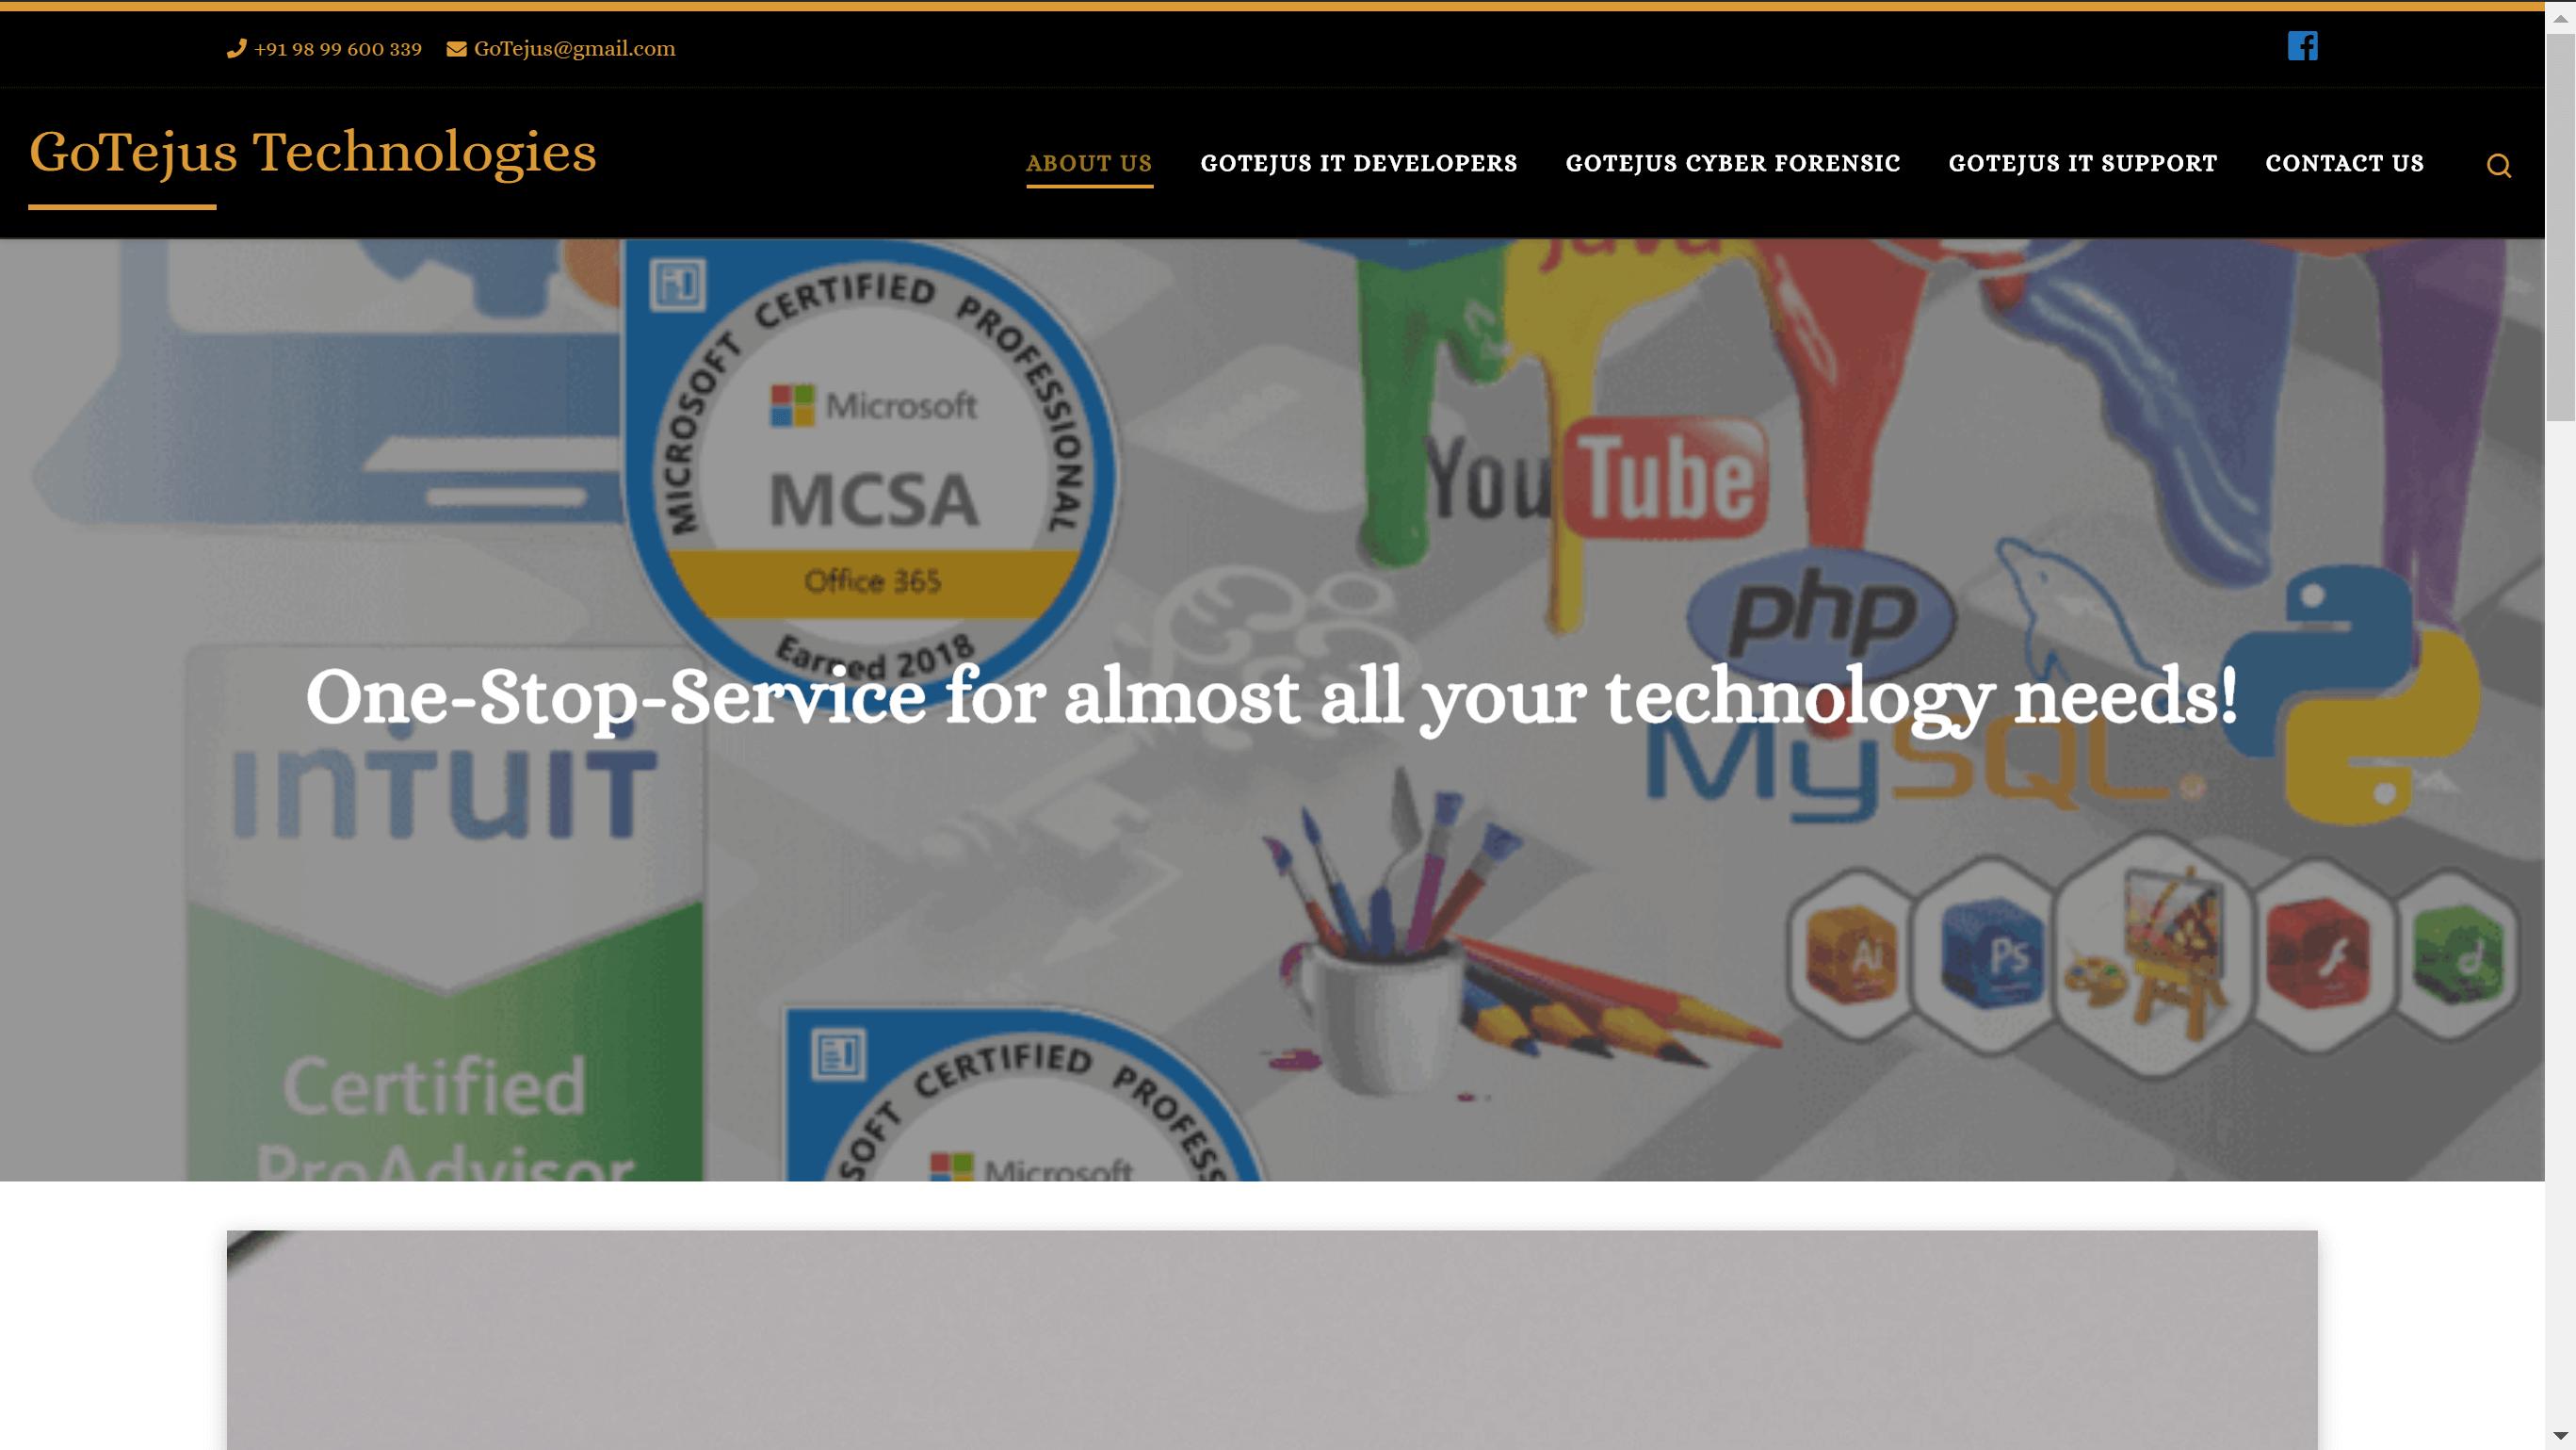 GoTejus Technologies